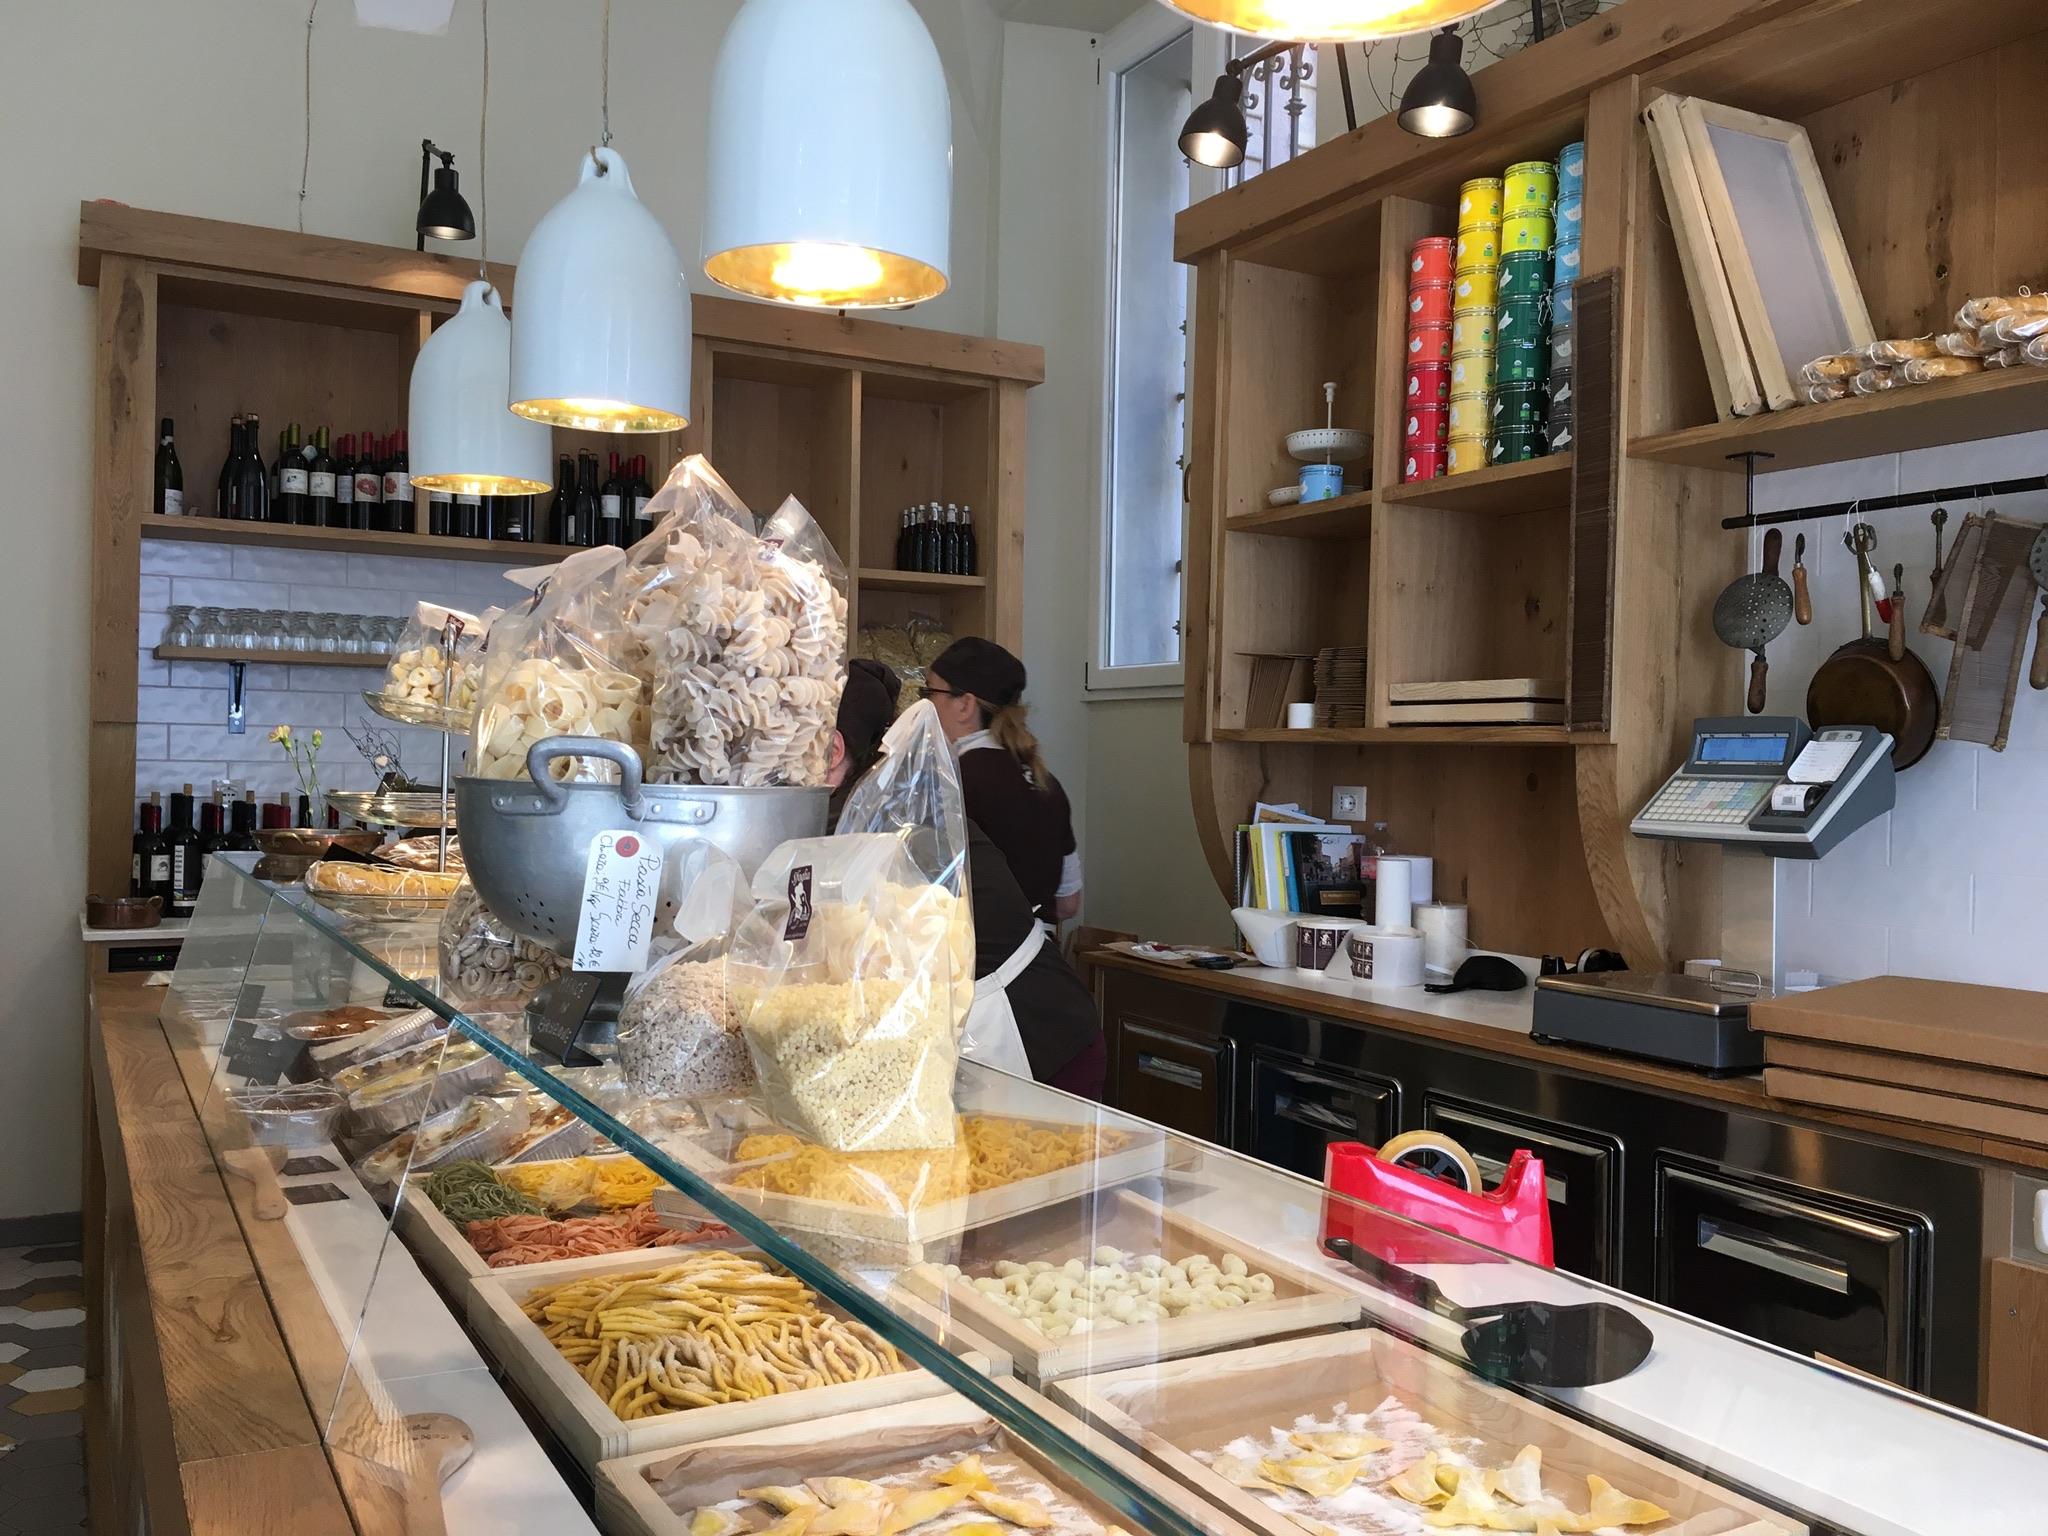 Takeout pasta counter at Sfoglia Rina